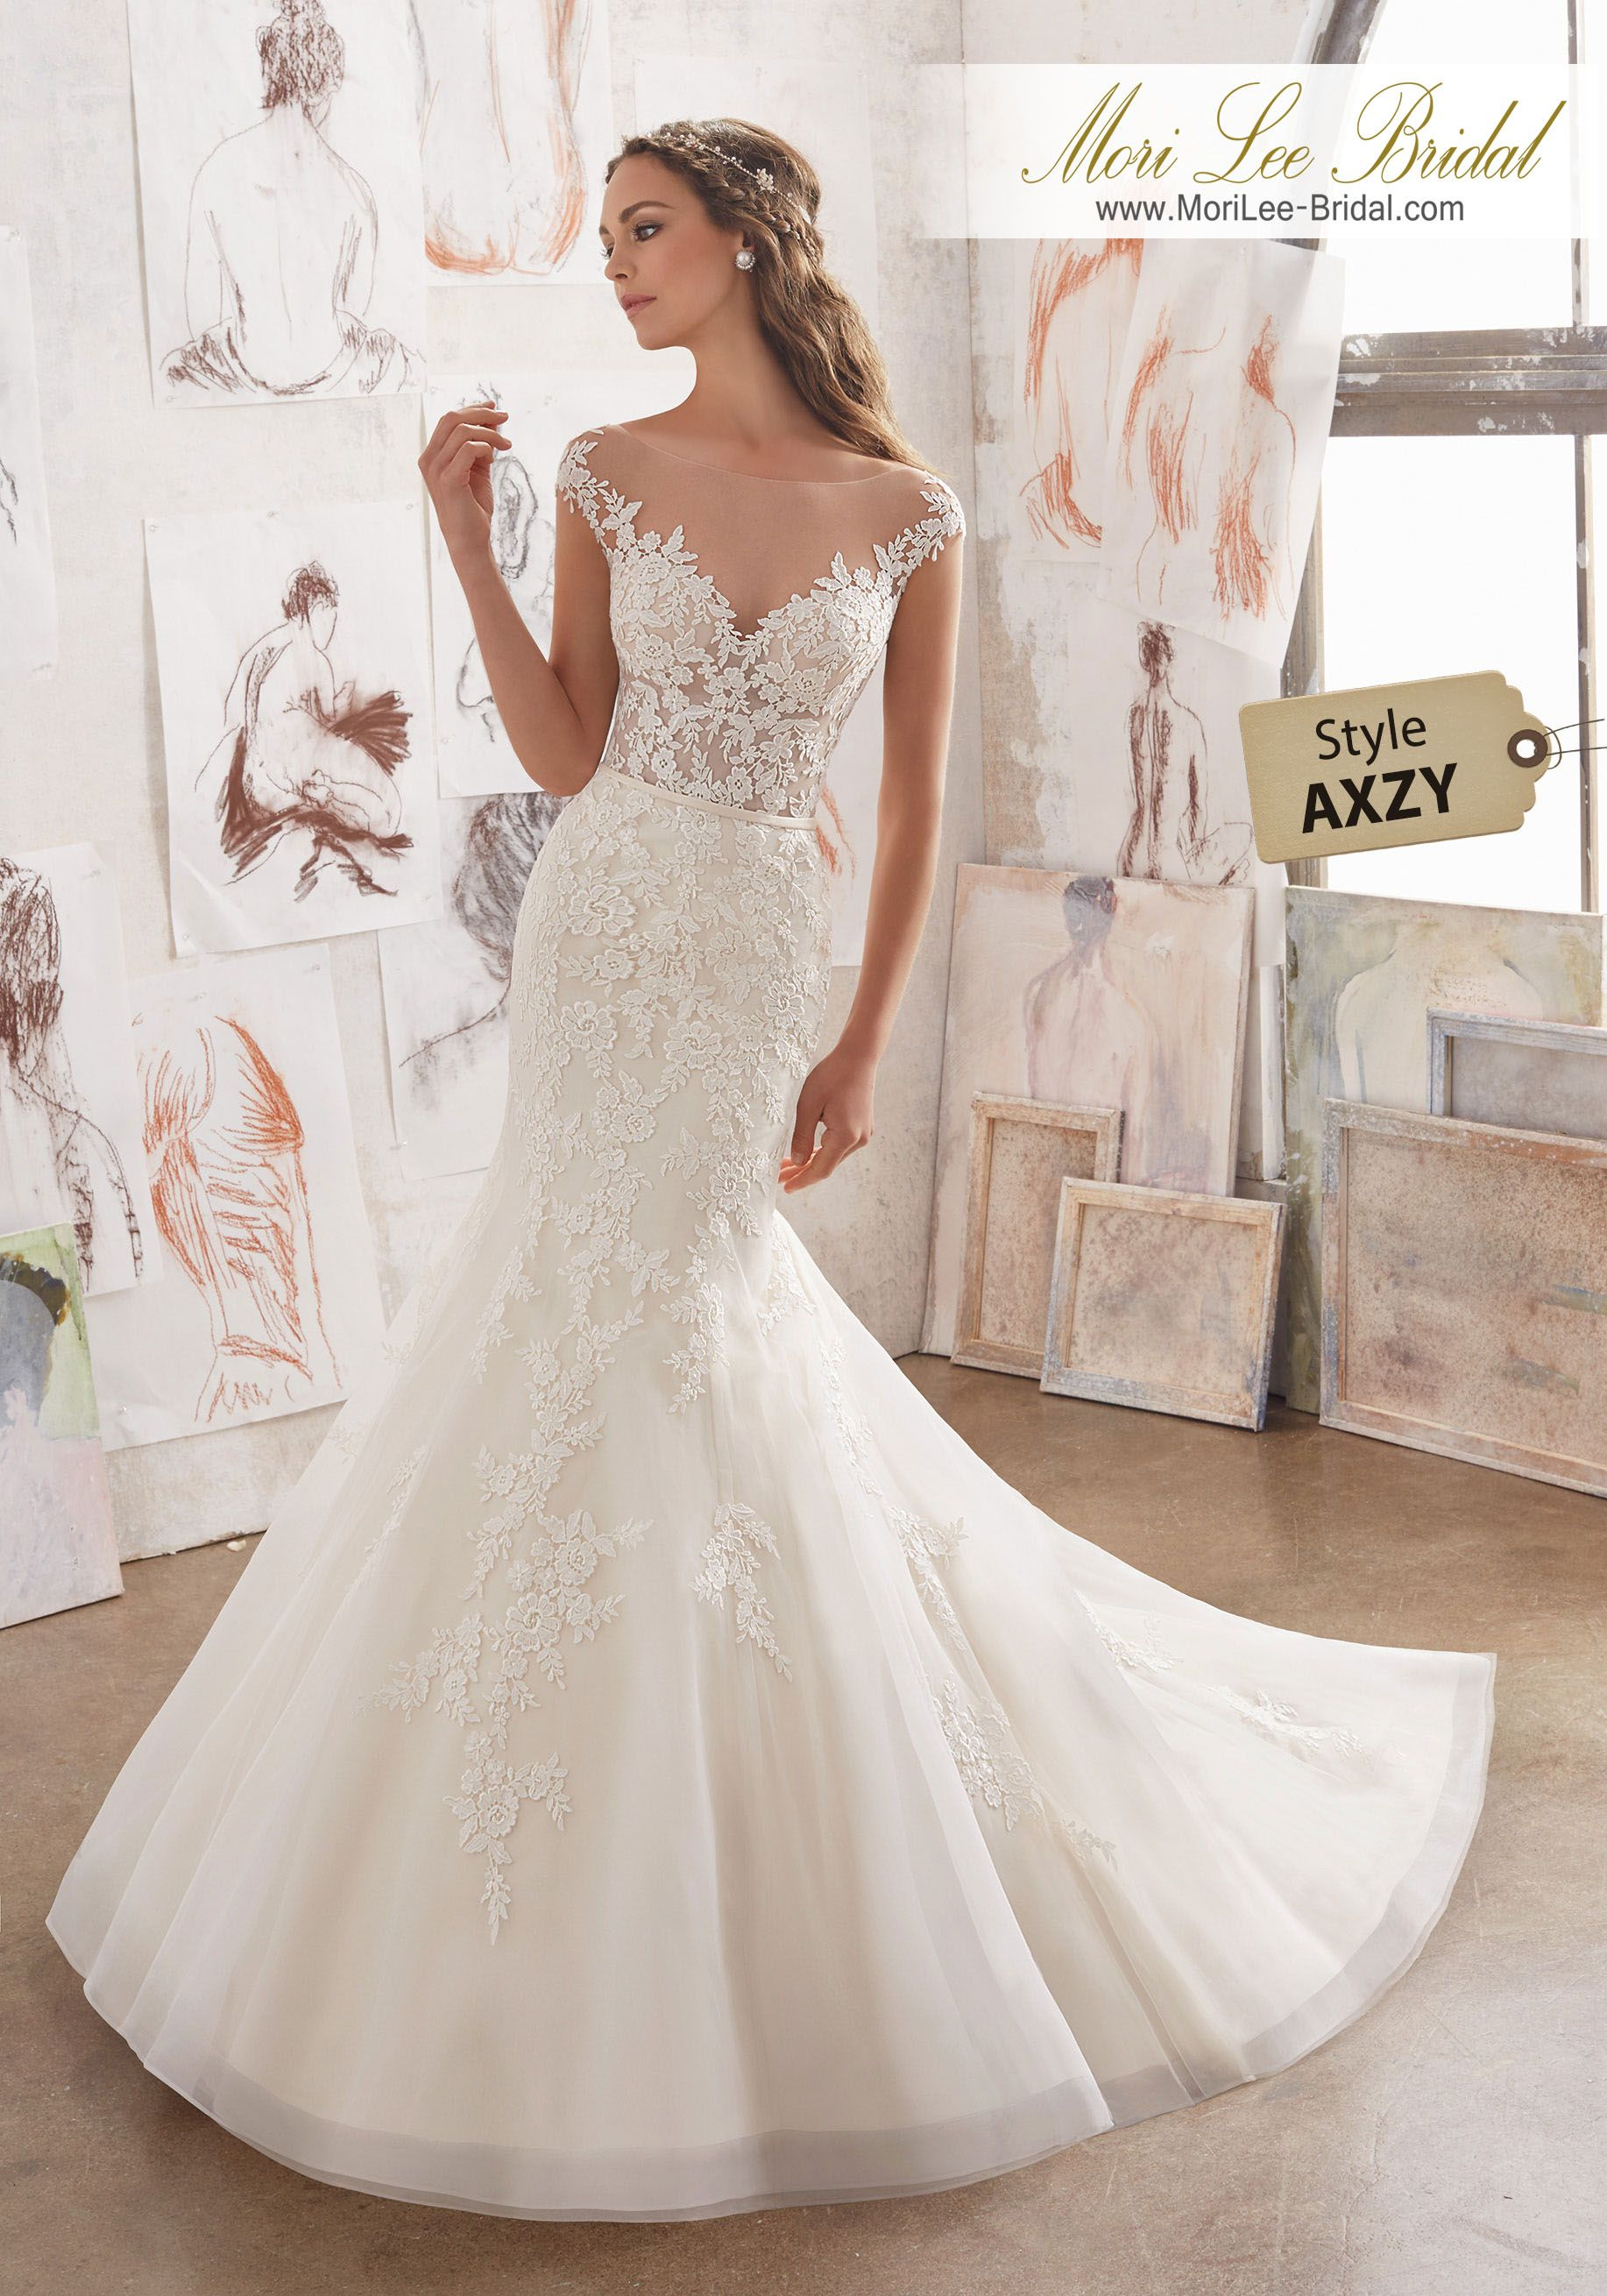 Style AXZY Martha Wedding Dress Gorgeous Fit & Flare Wedding Dress ...